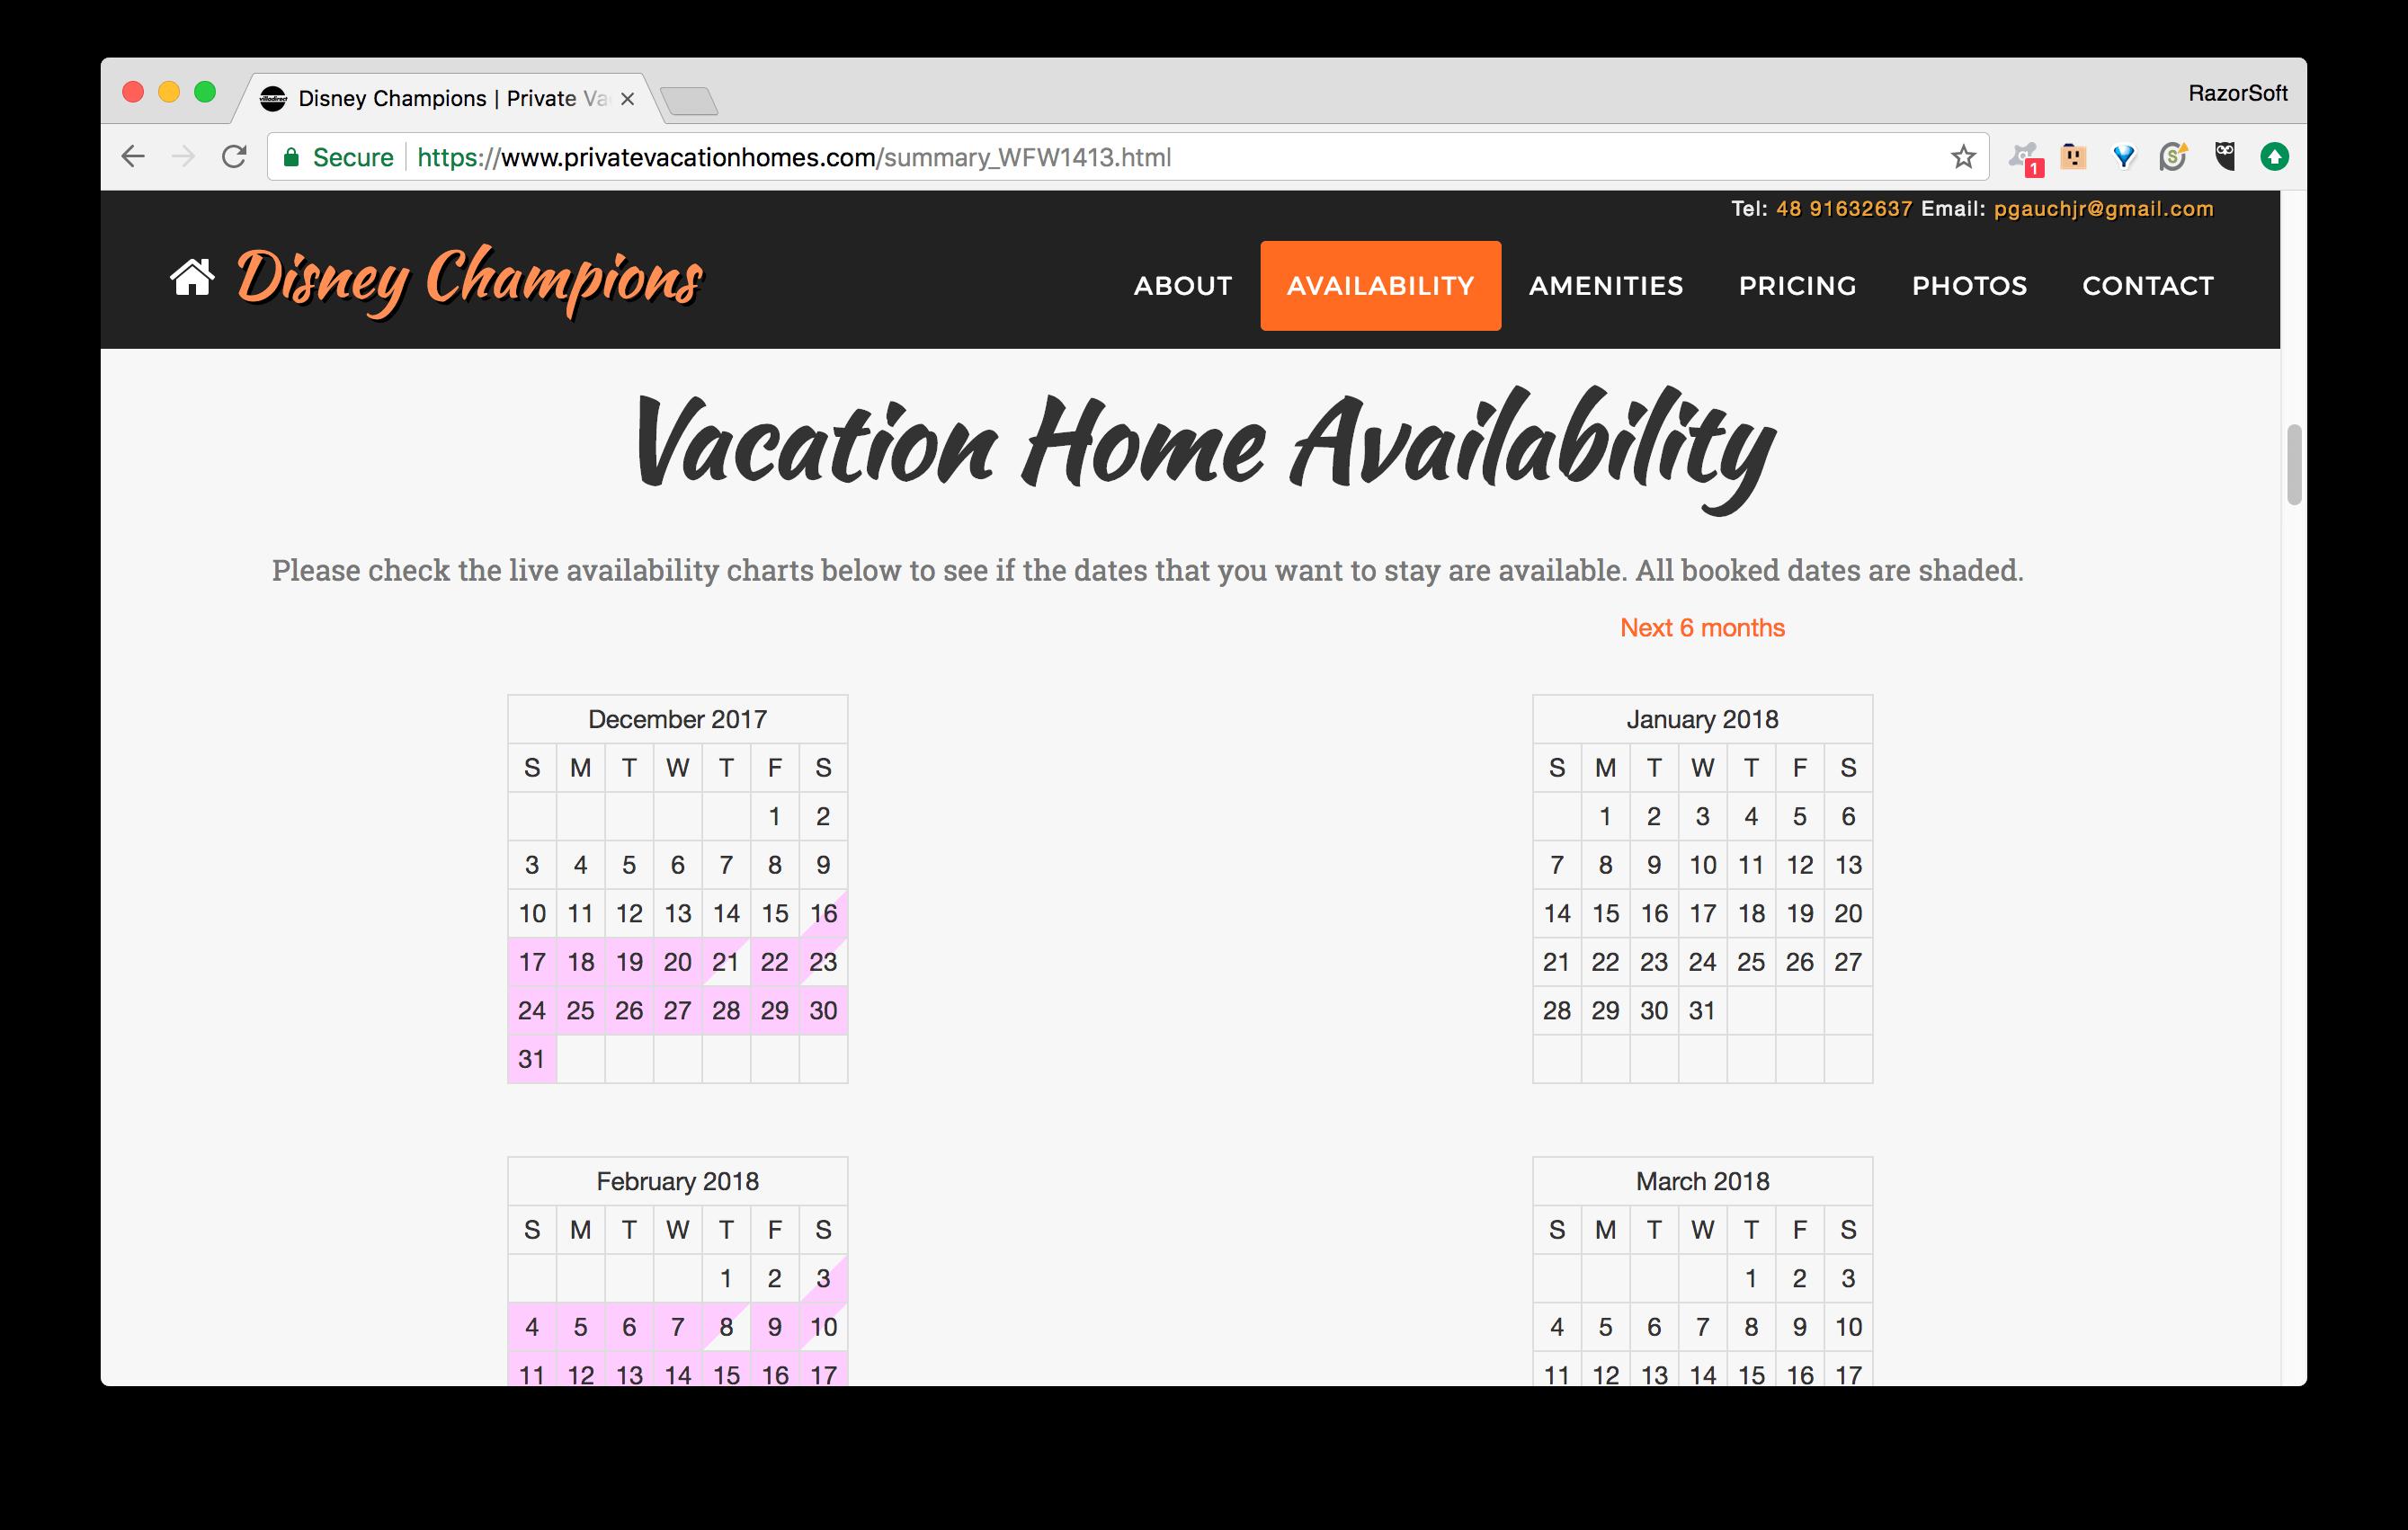 PrivateVacationHomes.com Availability